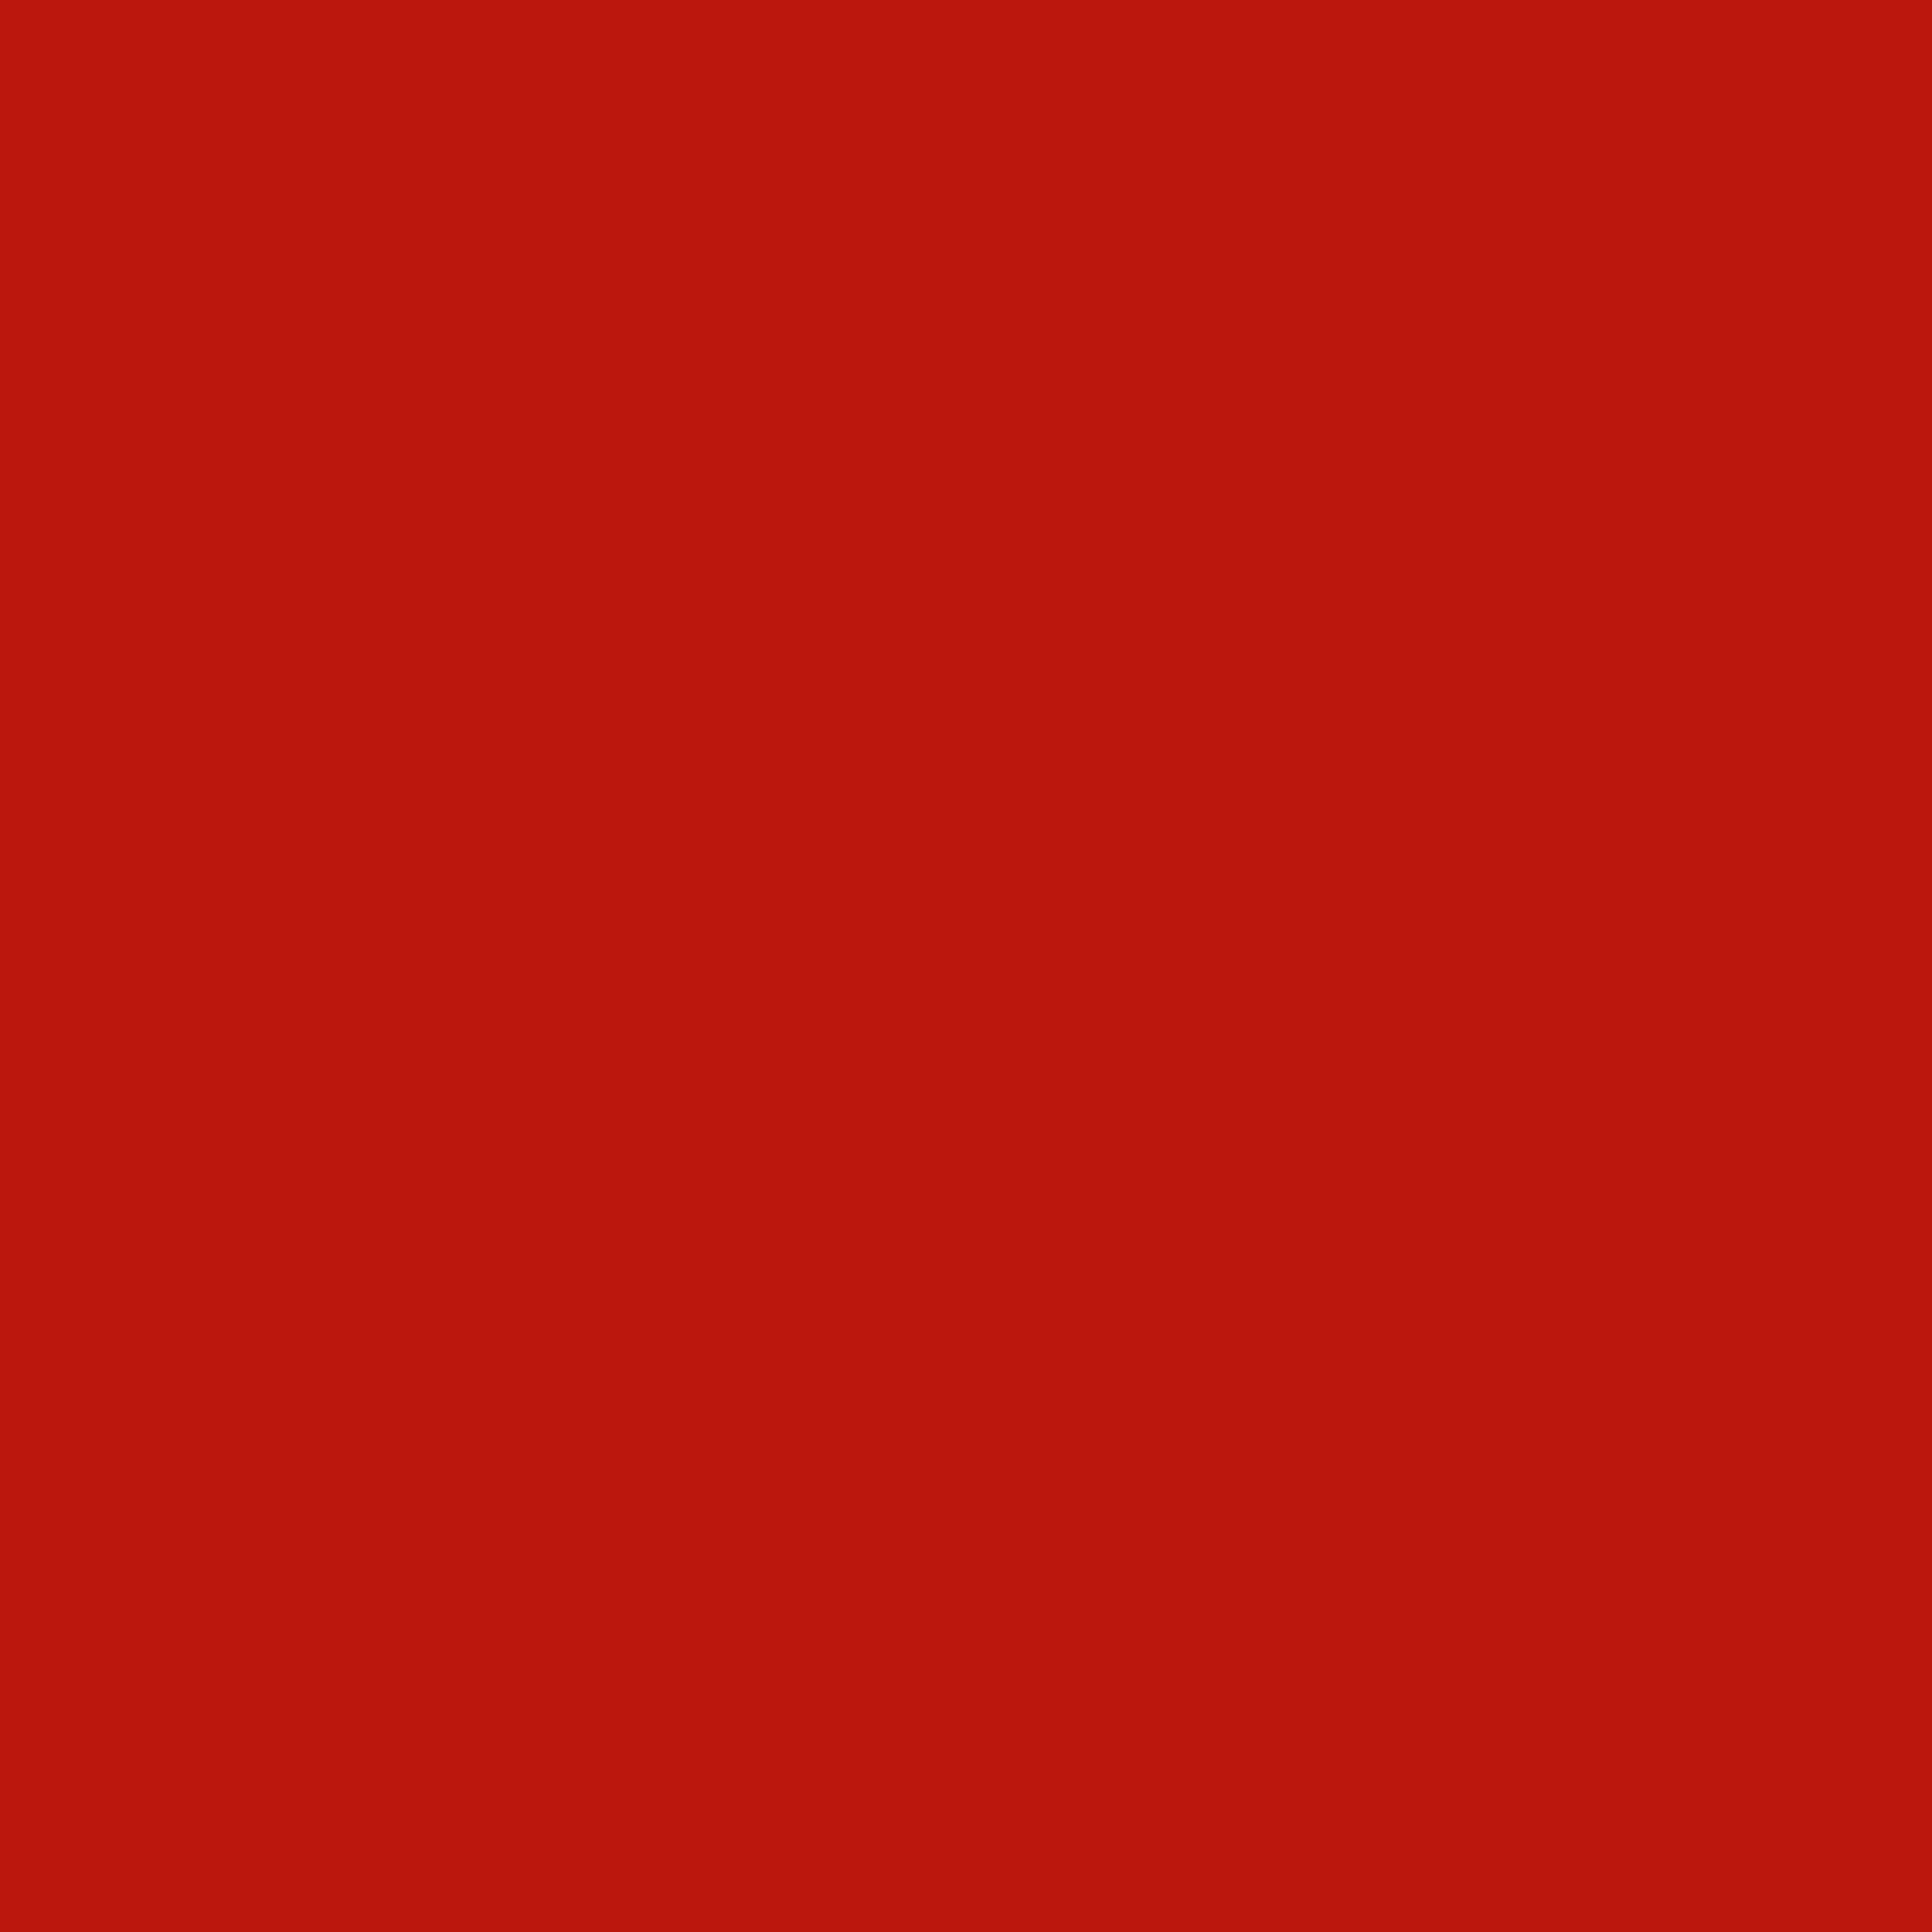 2048x2048 International Orange Engineering Solid Color Background